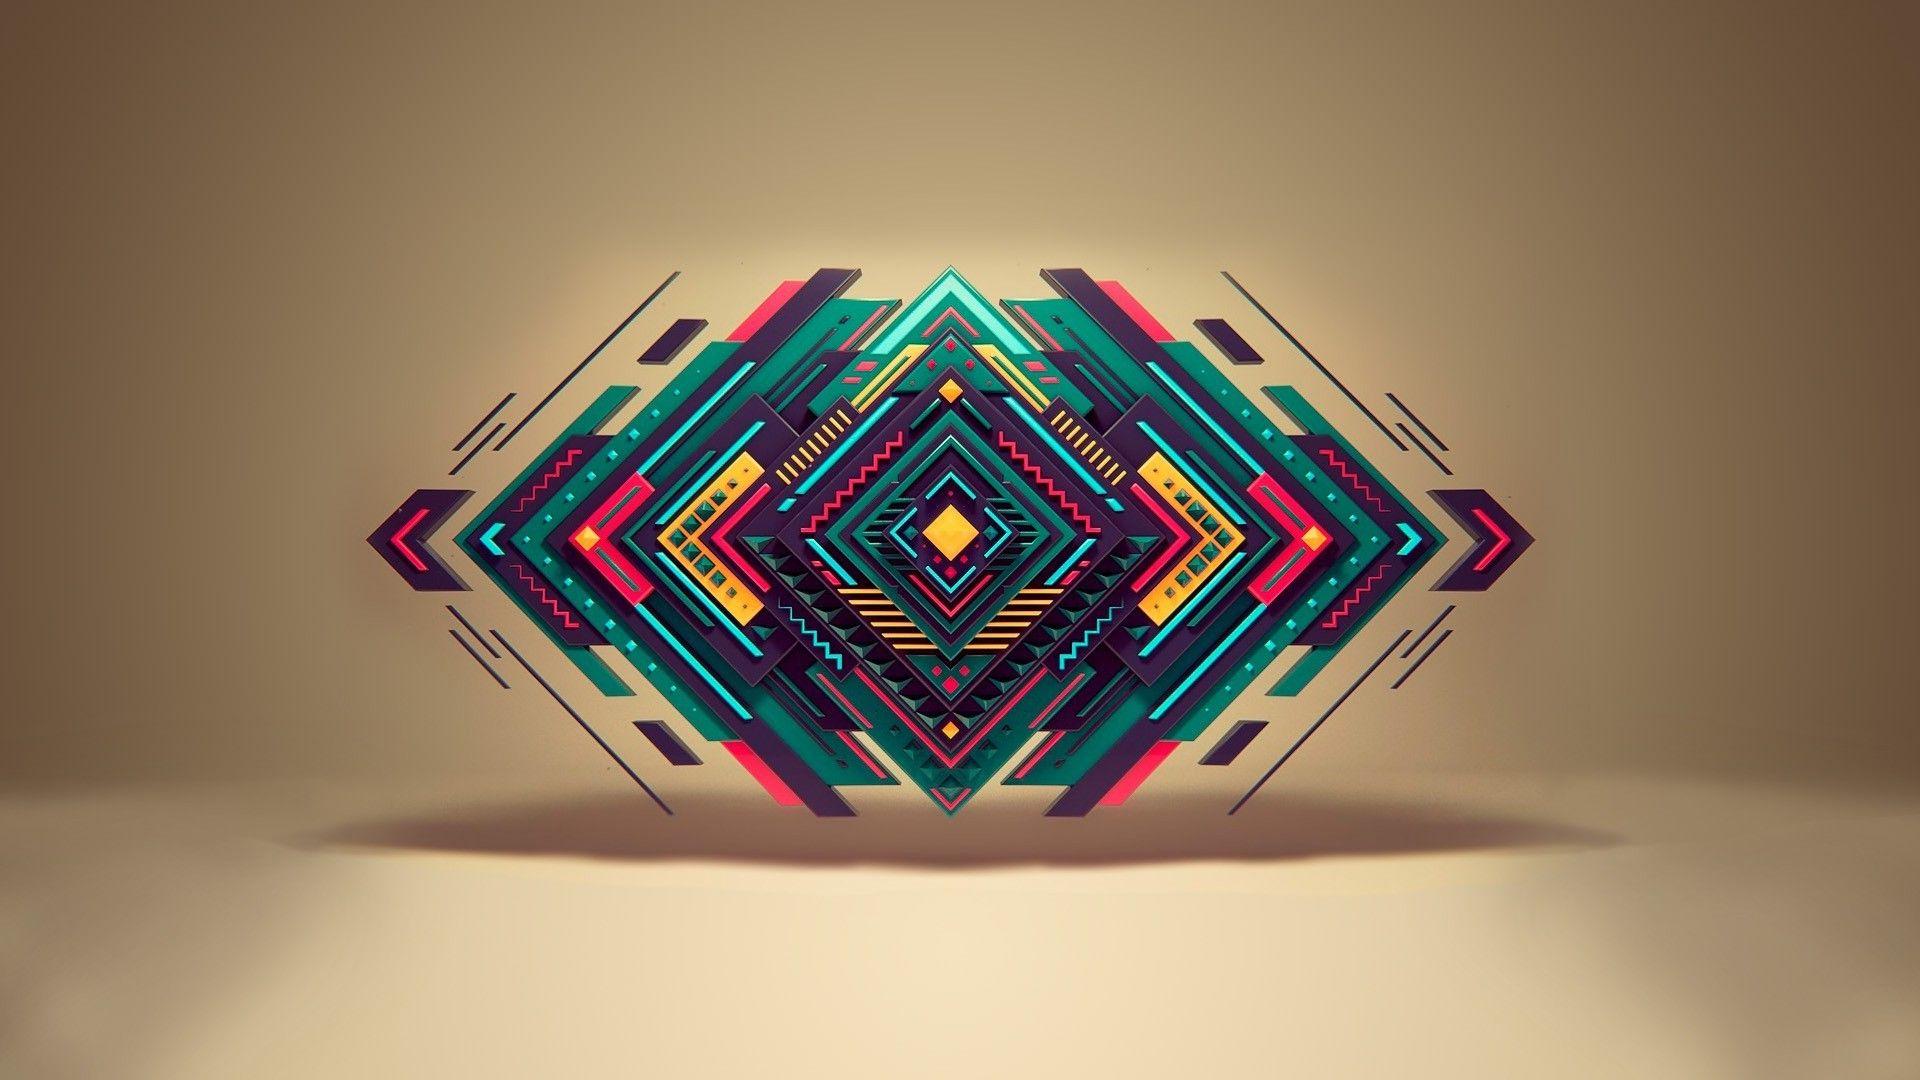 Graphic Design background wallpaper